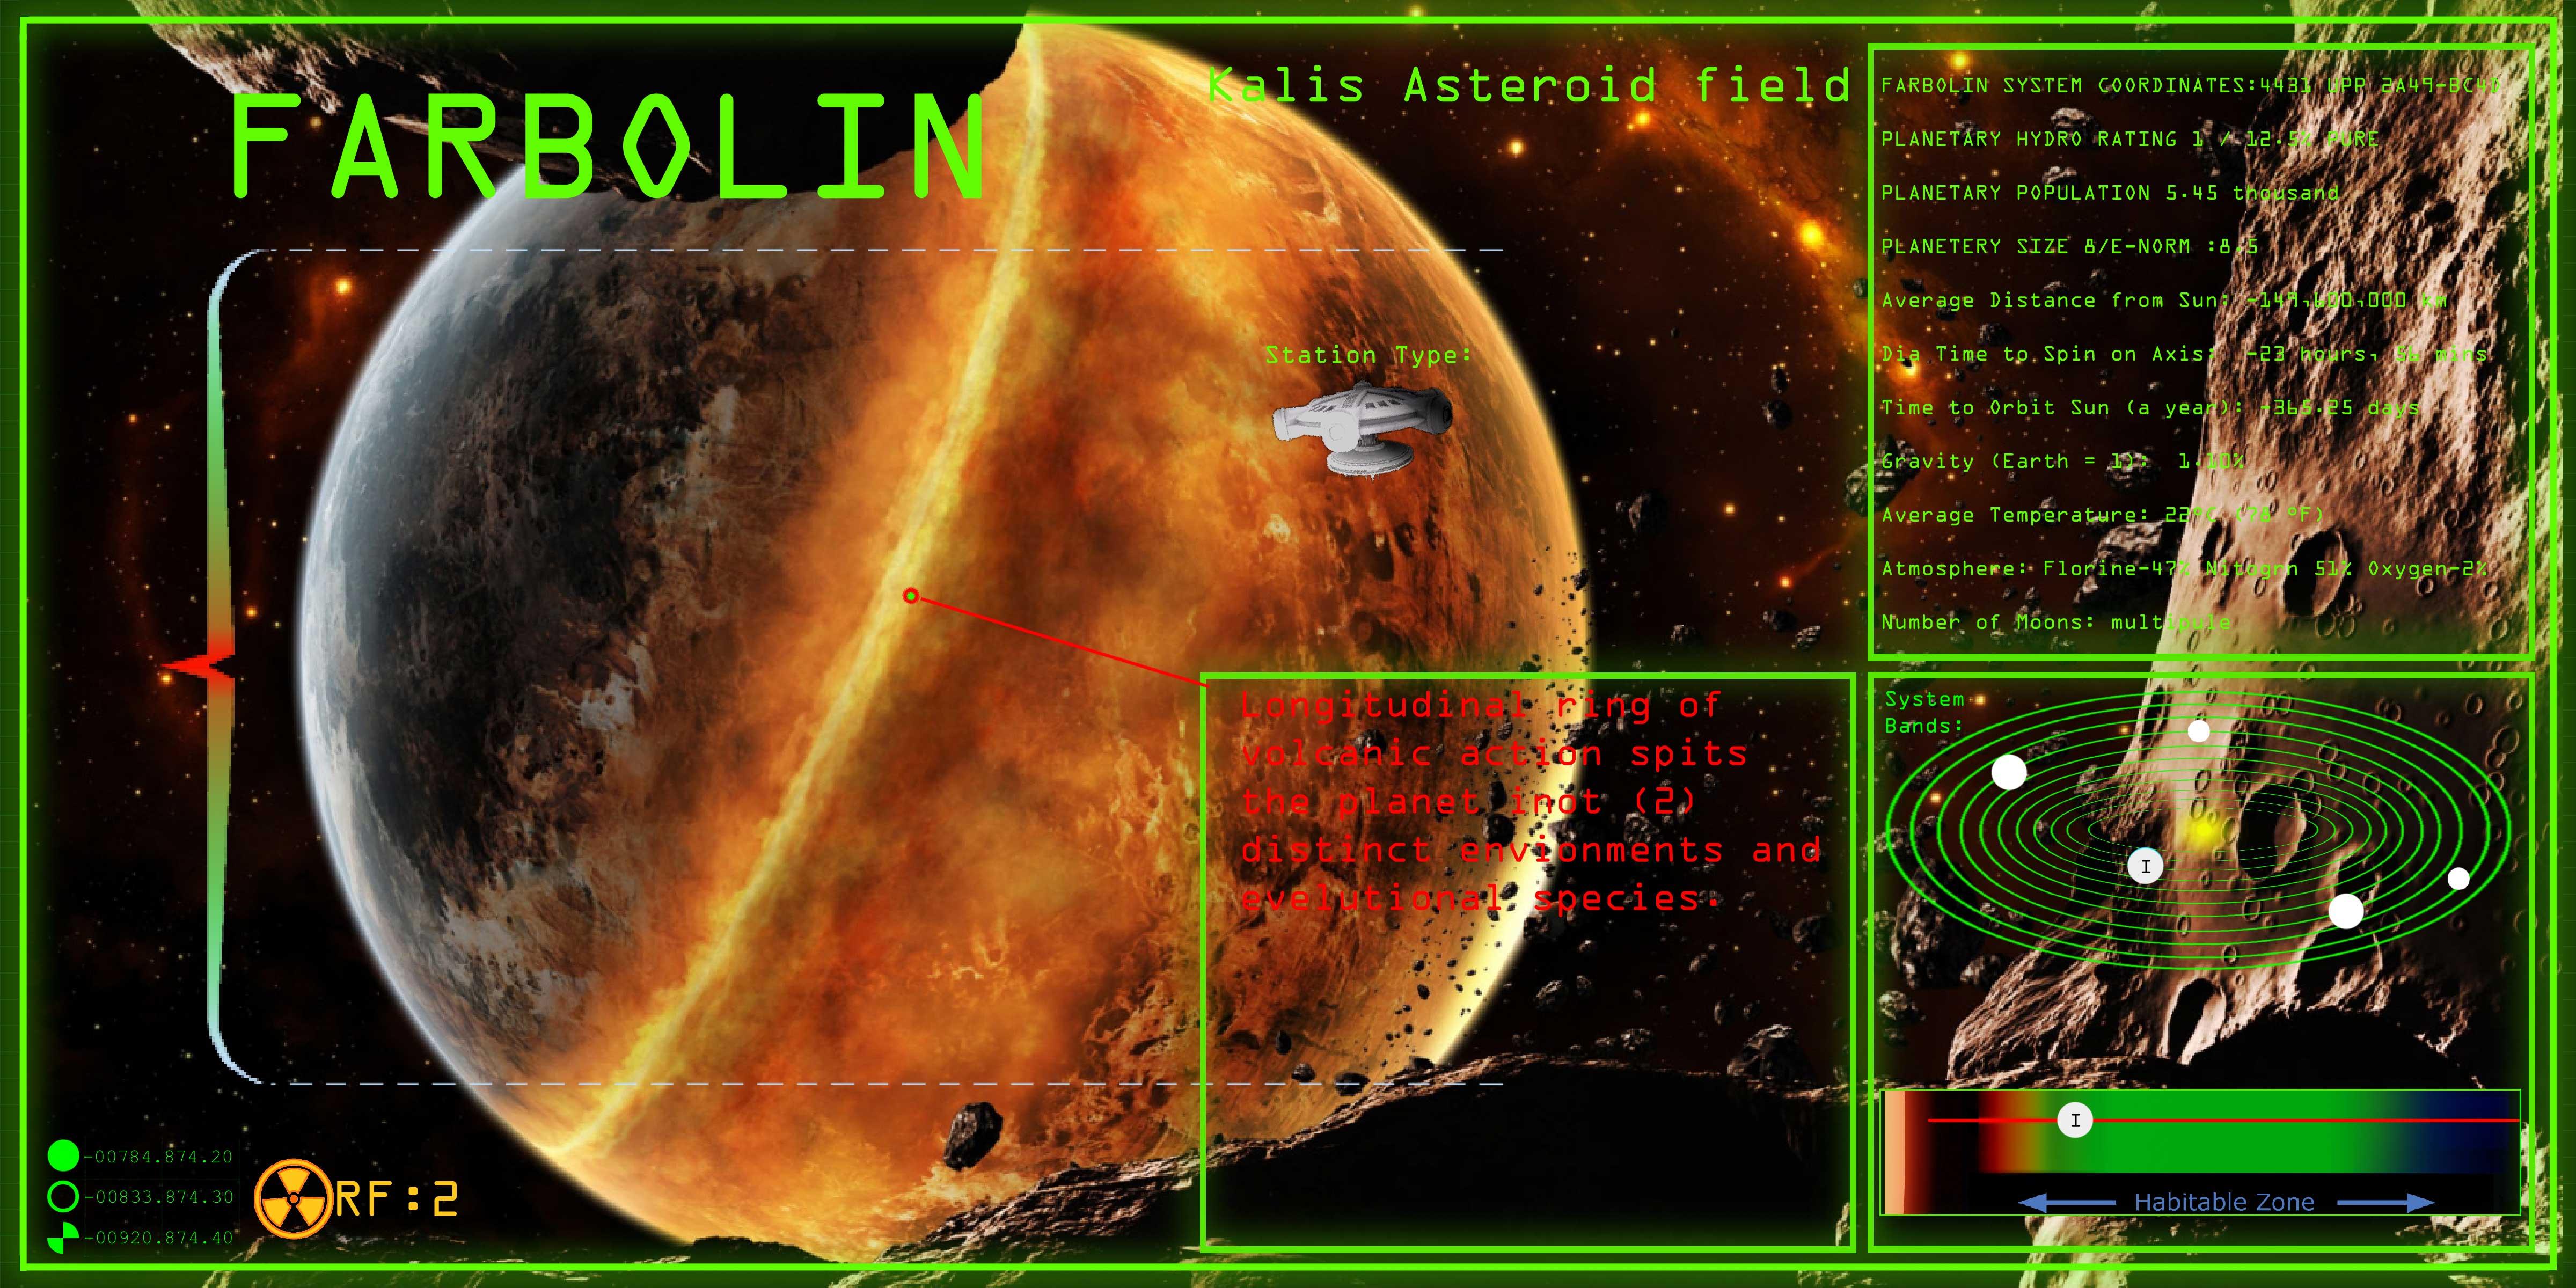 Planet Farboiln